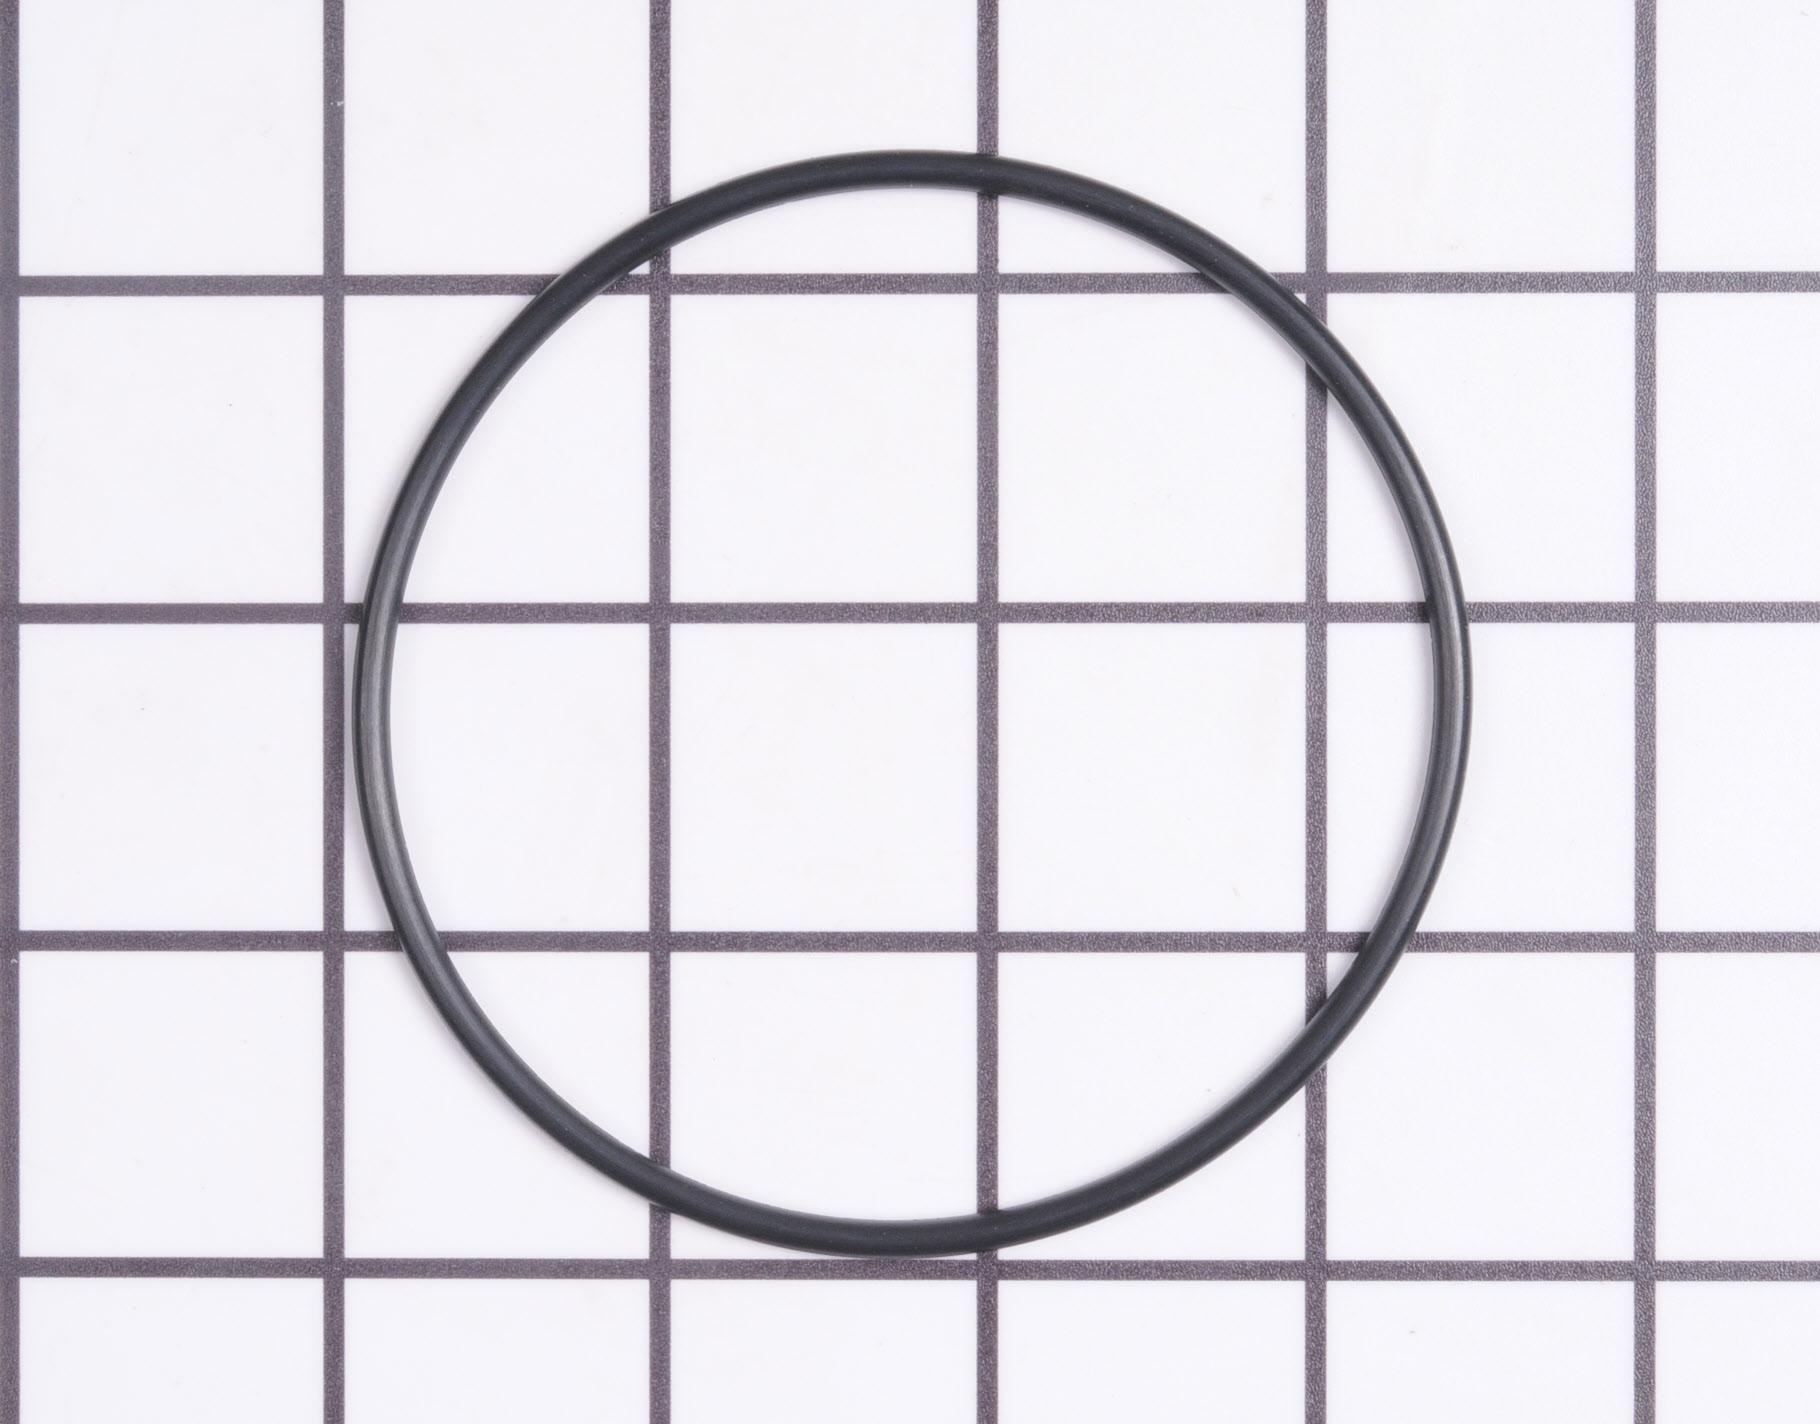 Pressure Washer Part #  - O-Ring - Karcher 6.362-471.0